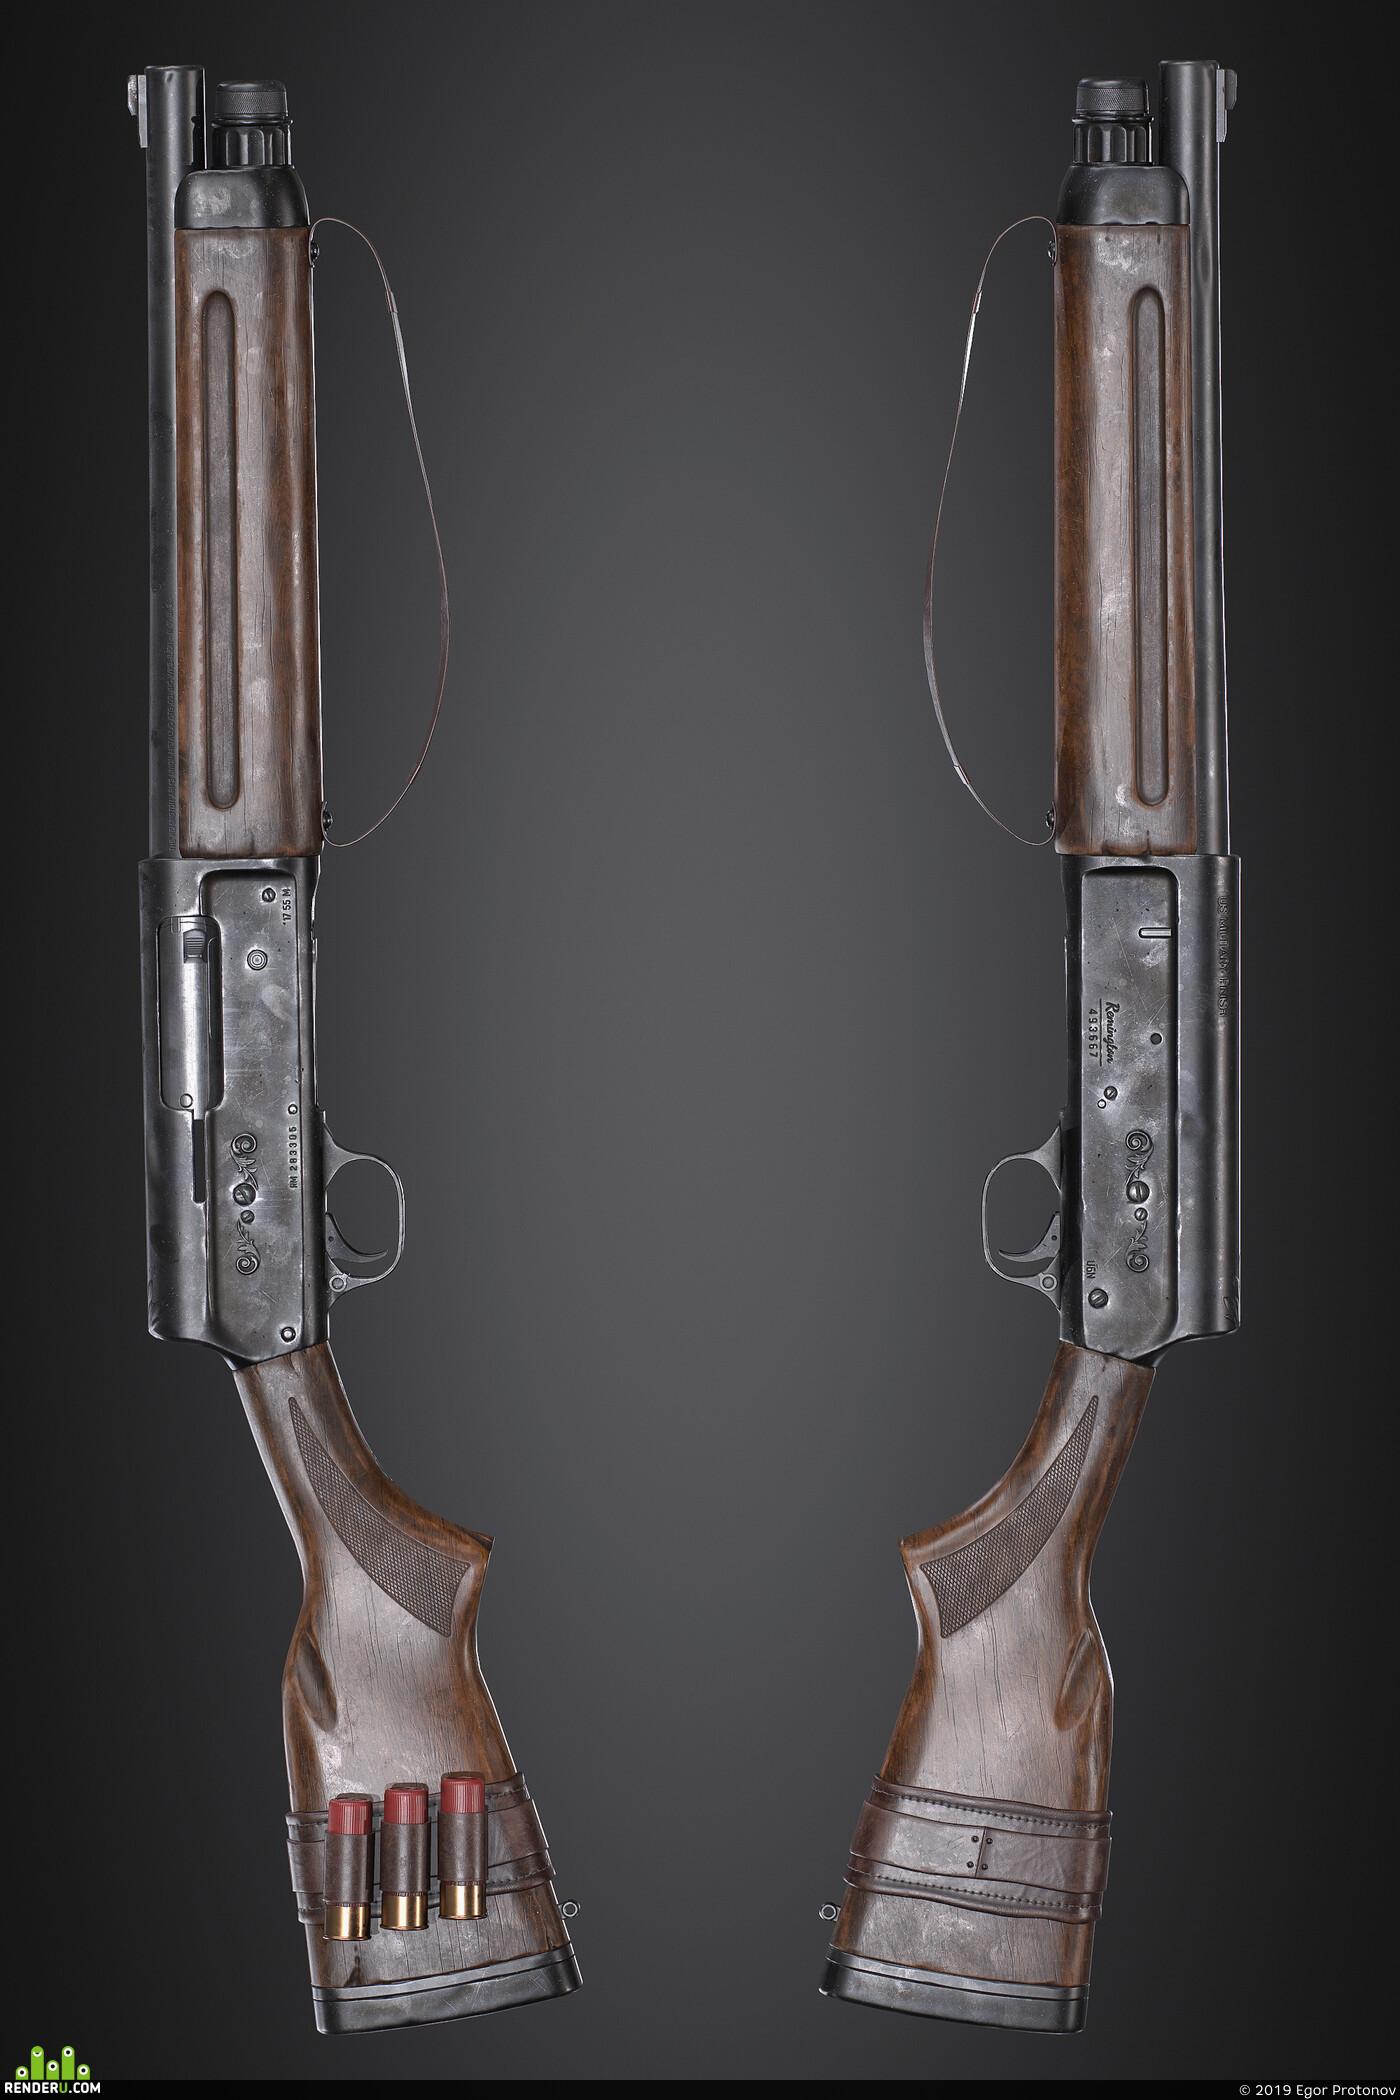 3d, game, art, Компьютерная графика/CG, shotgun, remington, weapon, gun, modeling